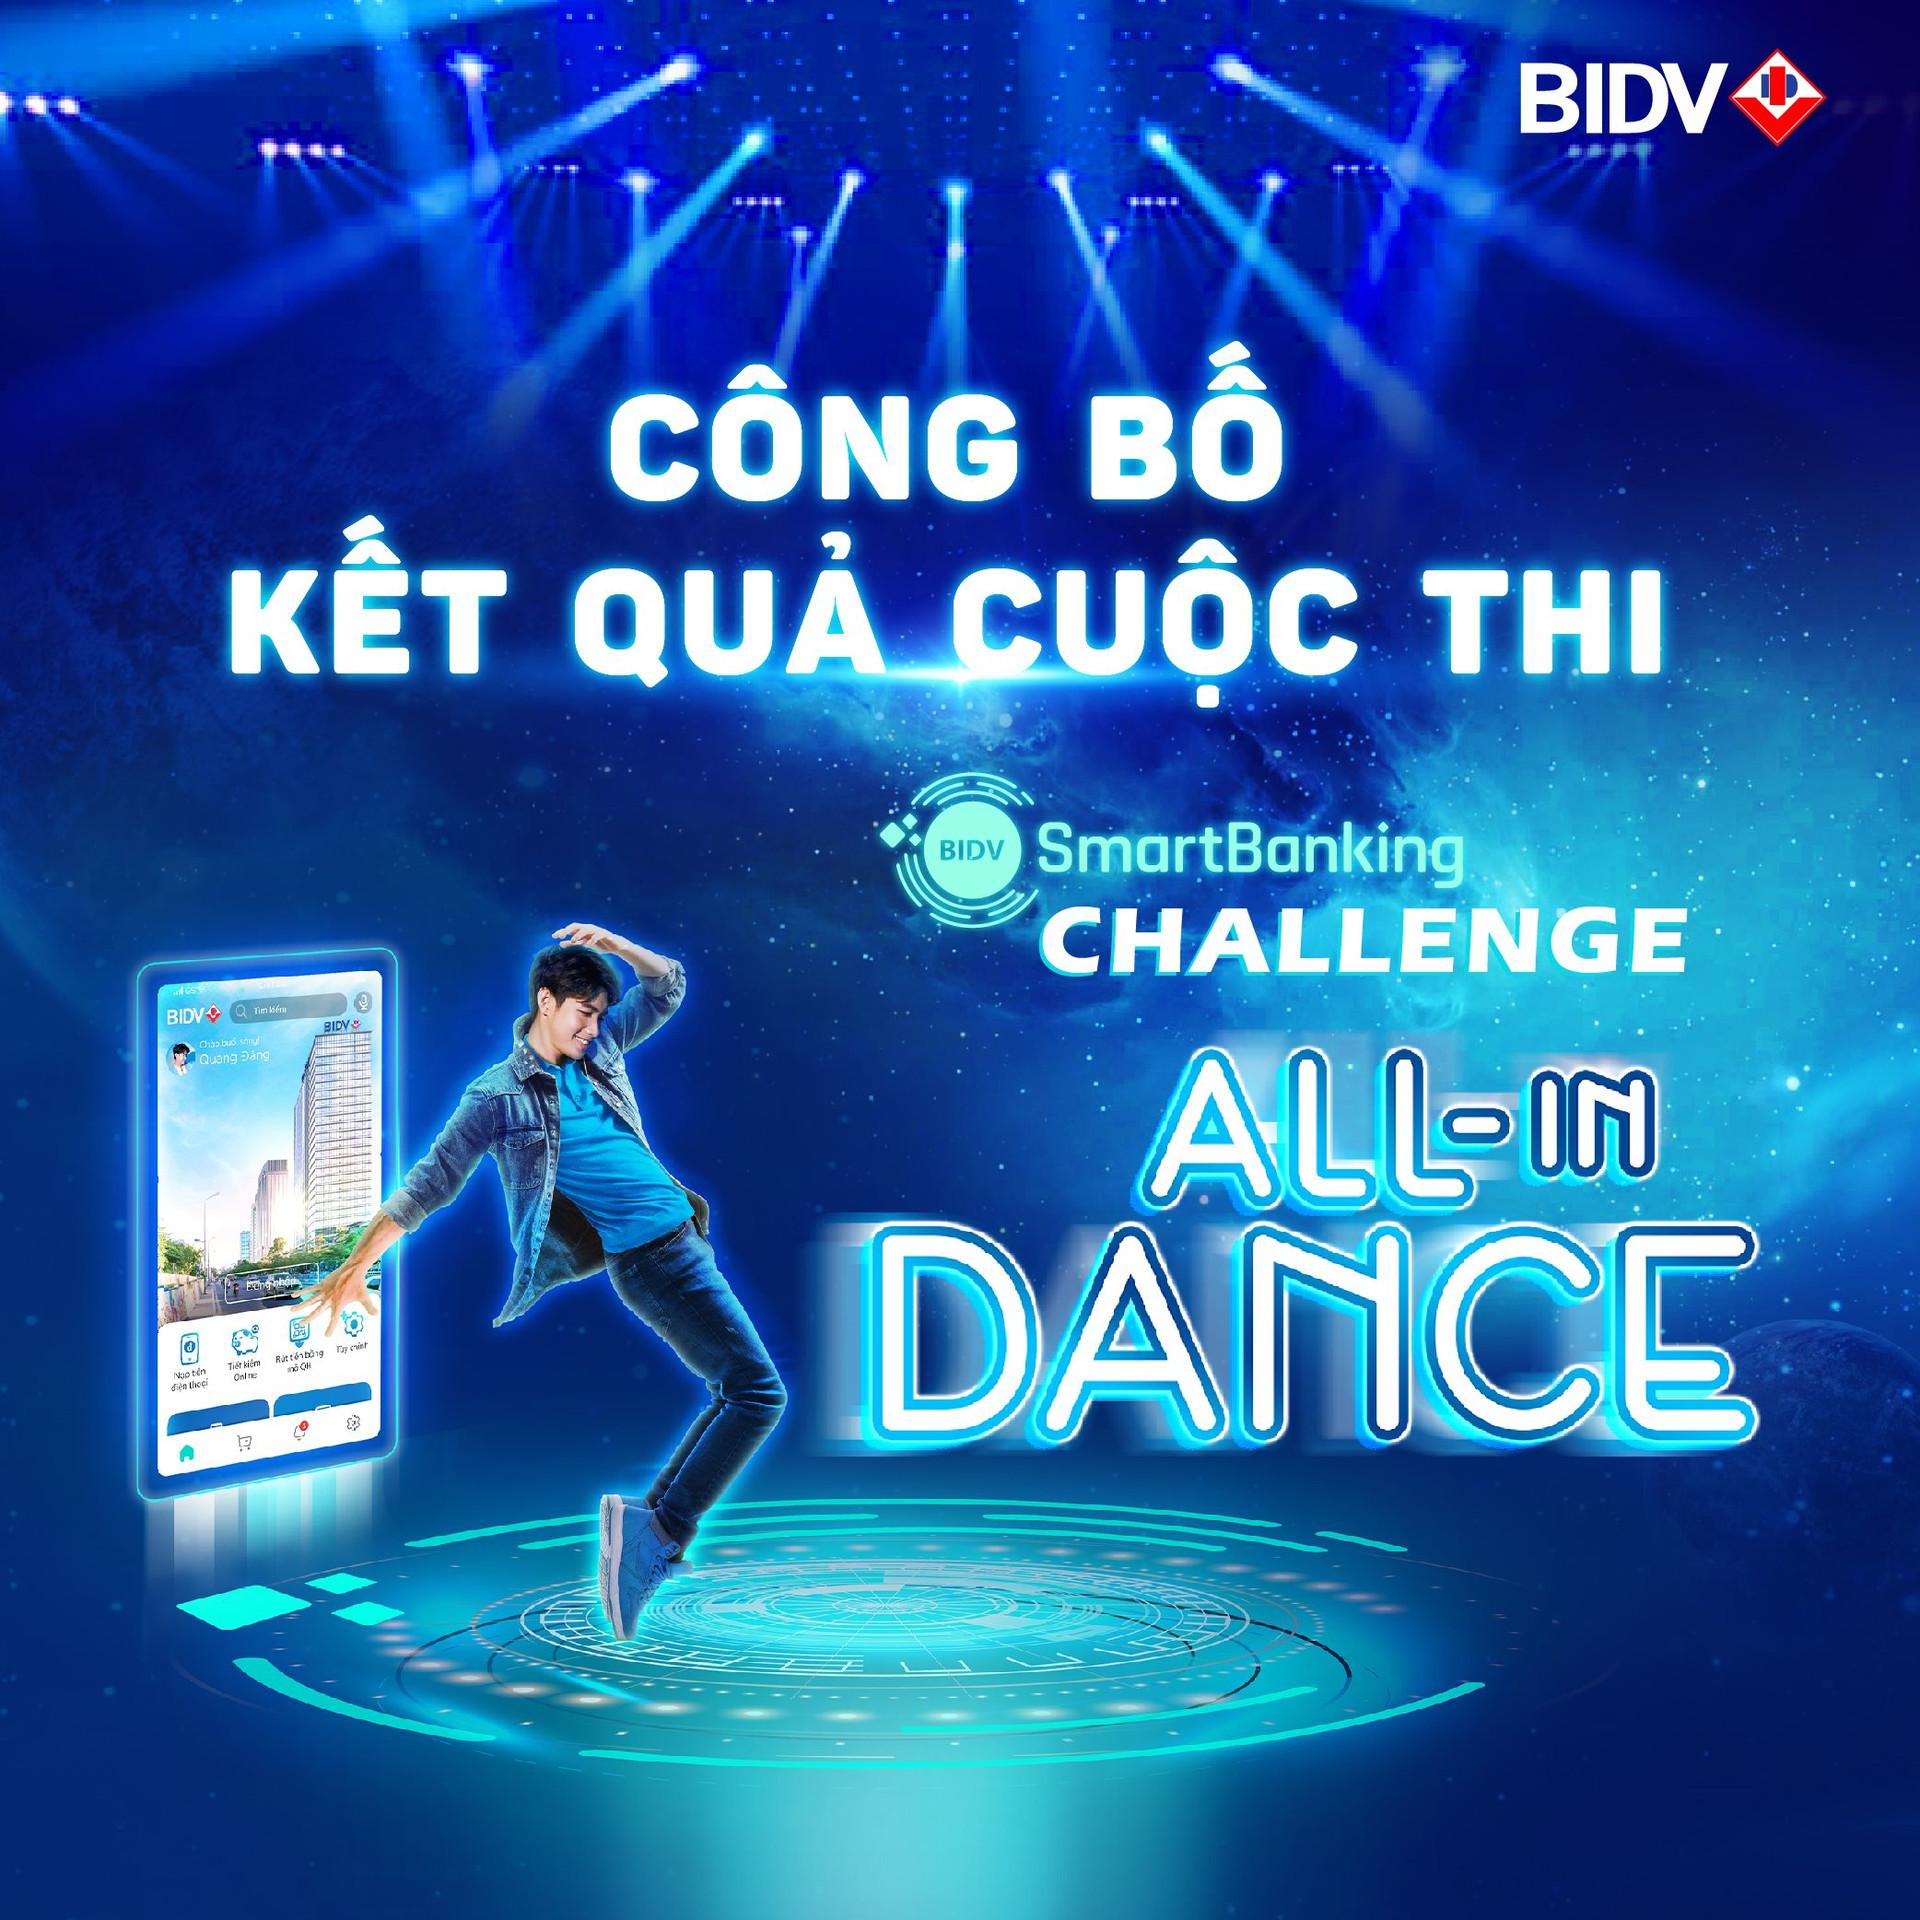 bidv_dance_congboketqua-01-1-.jpg